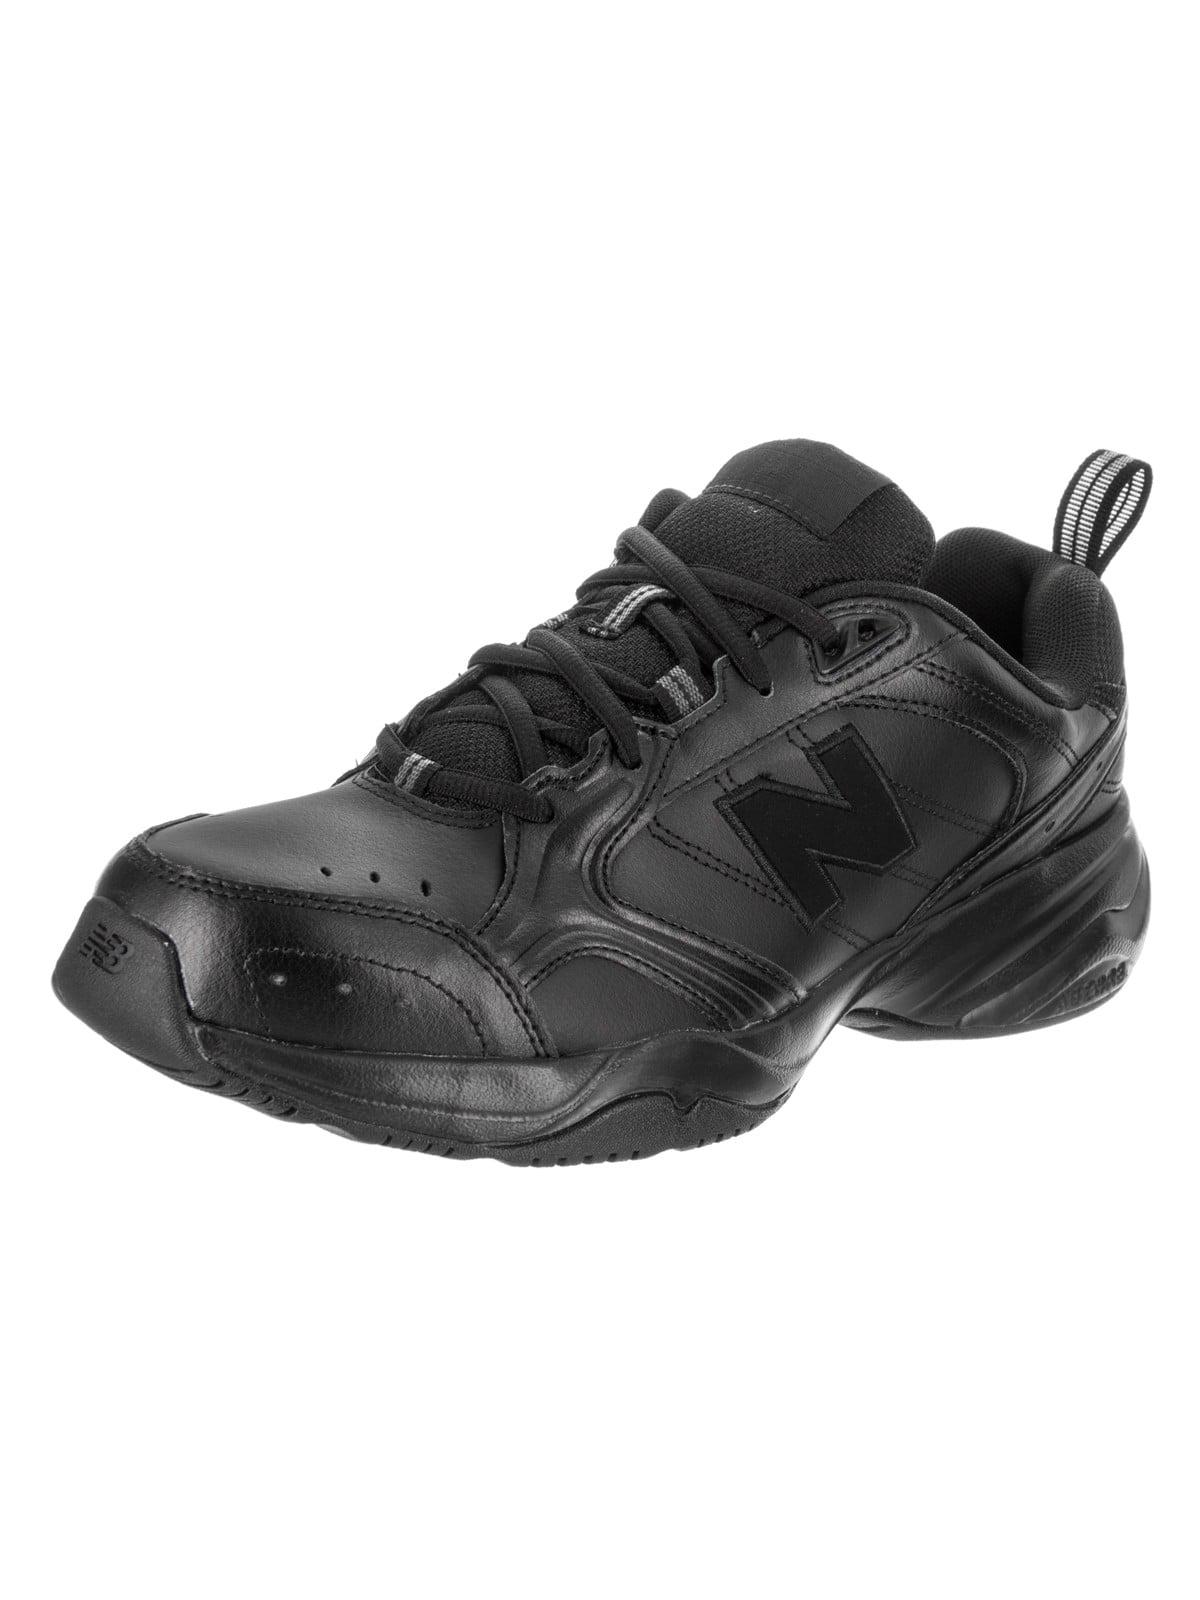 New Balance Men's MX624AB2 2E Wide Training Shoe by New Balance